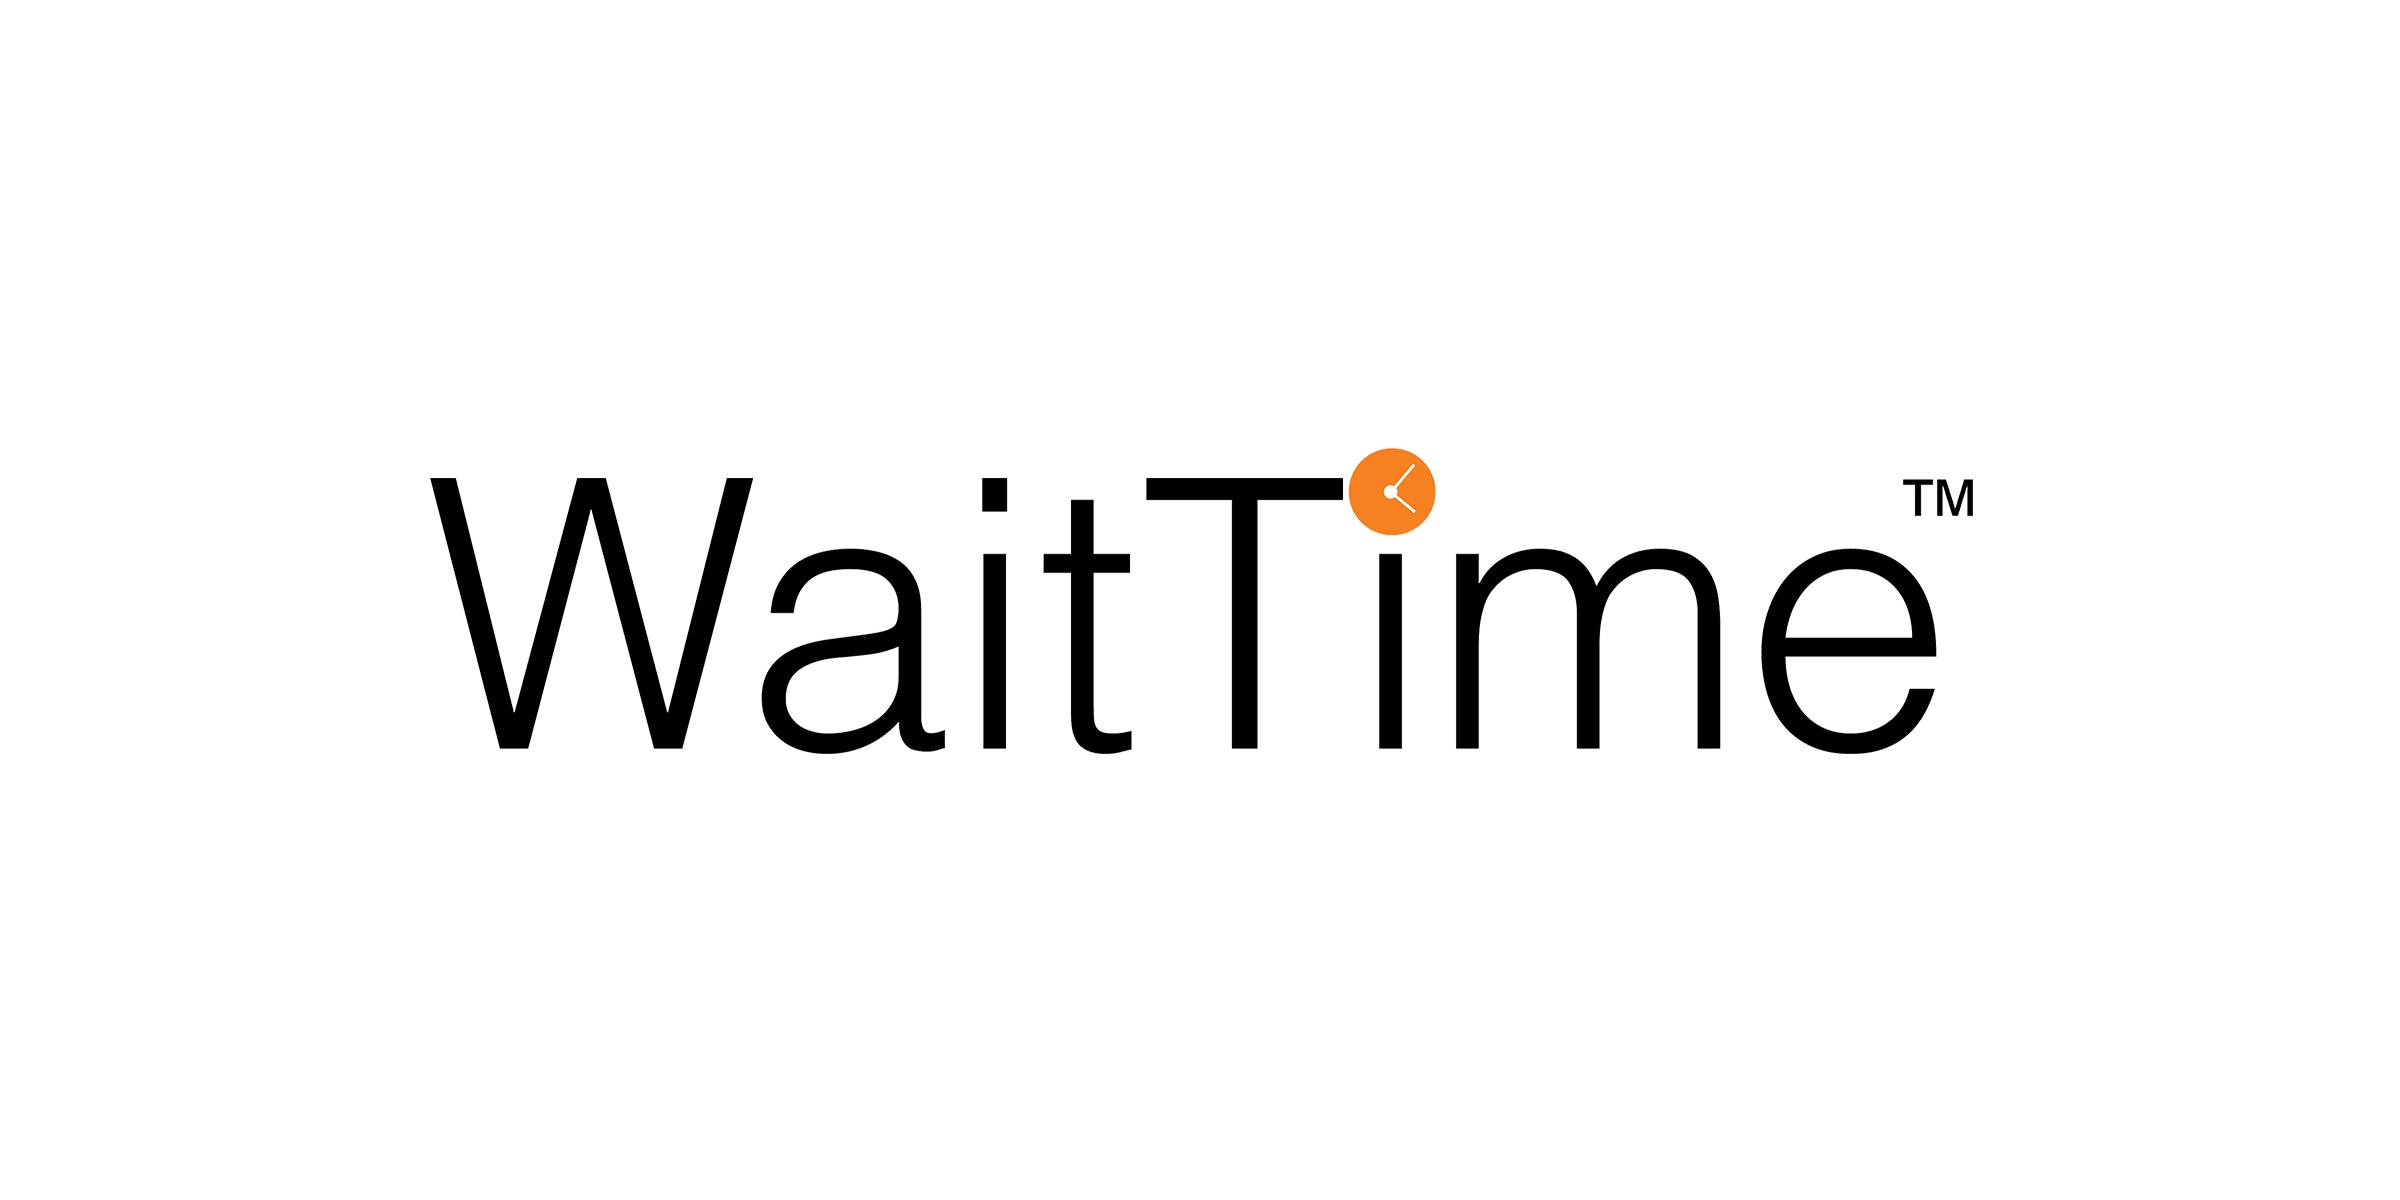 WaitTime company logo